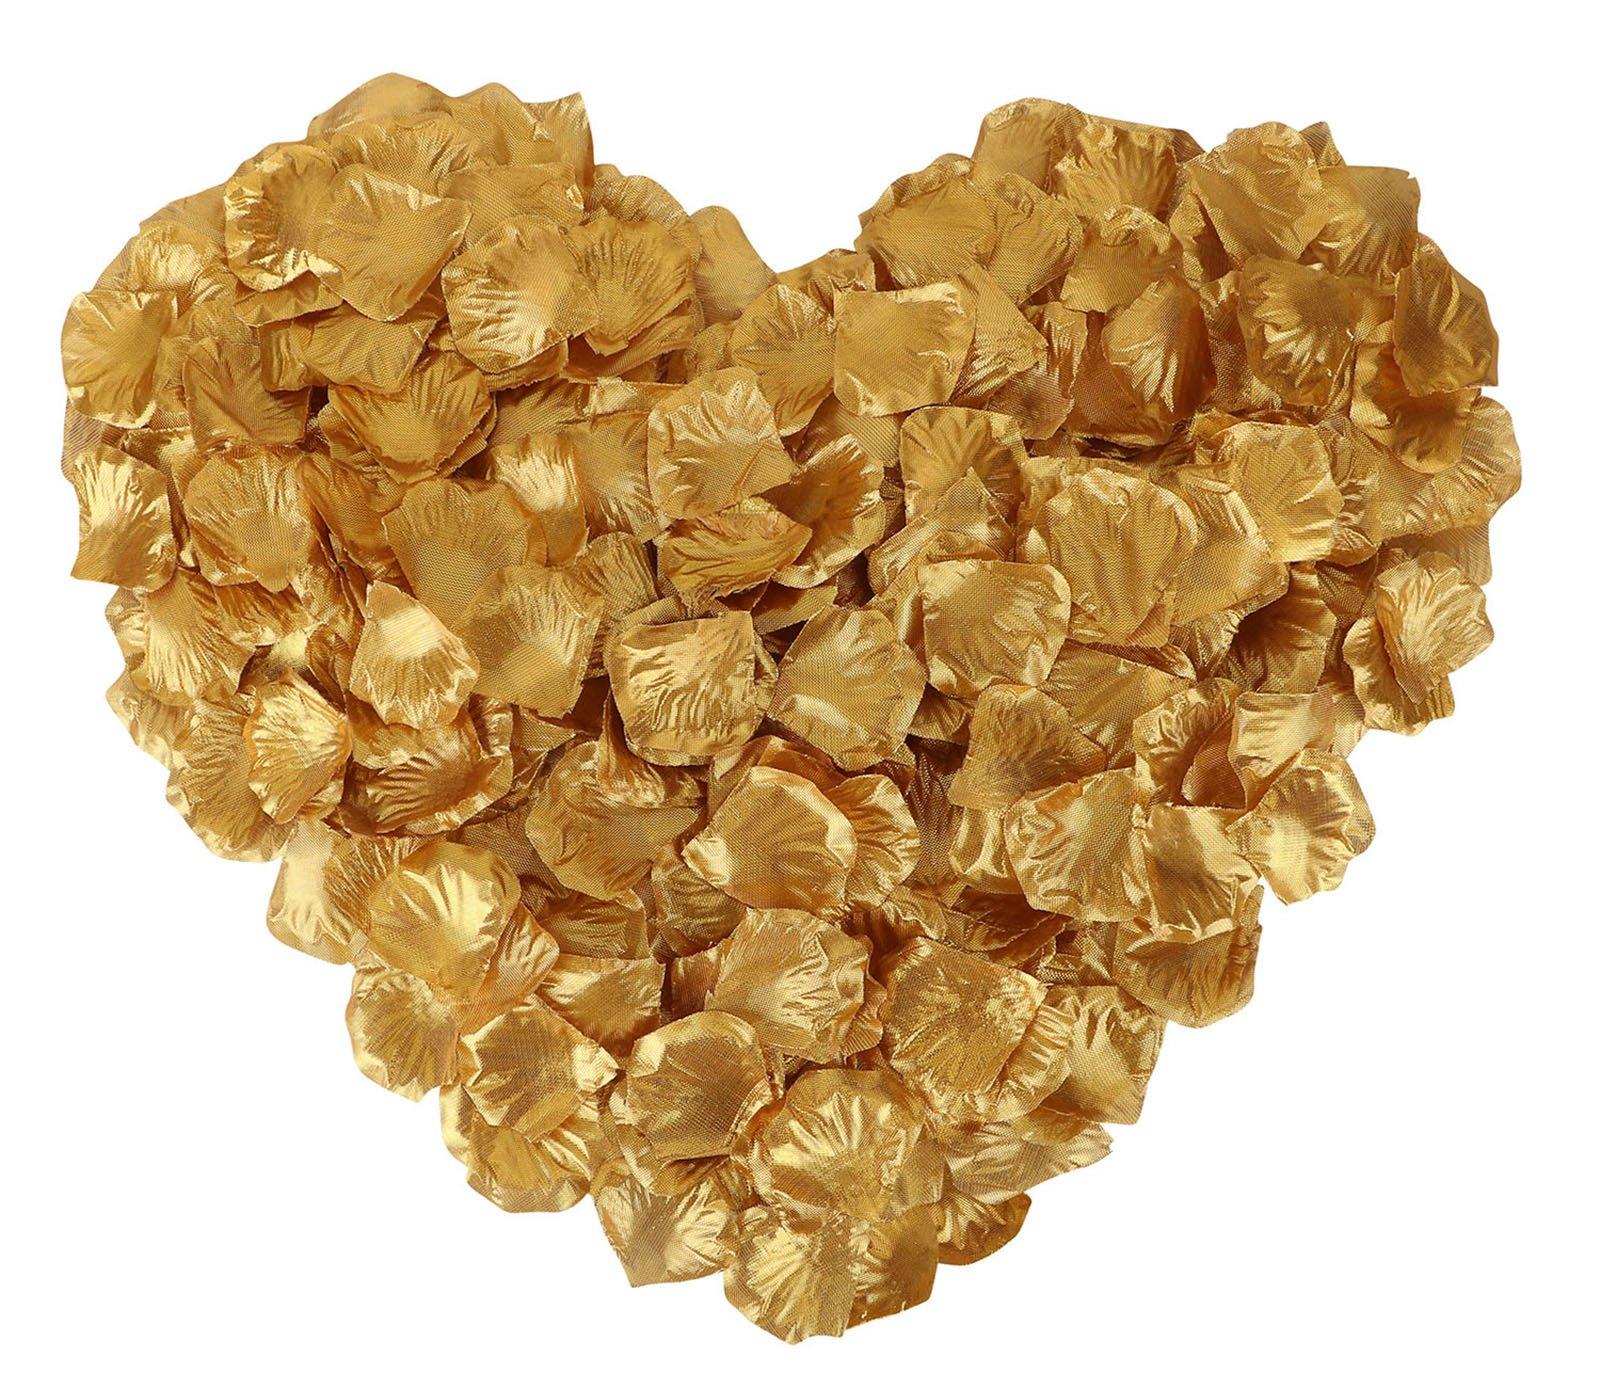 silk flower arrangements jasmine 1000 pieces non-woven rose petals artificial flower petals for wedding confetti valentine day flower décor,gold